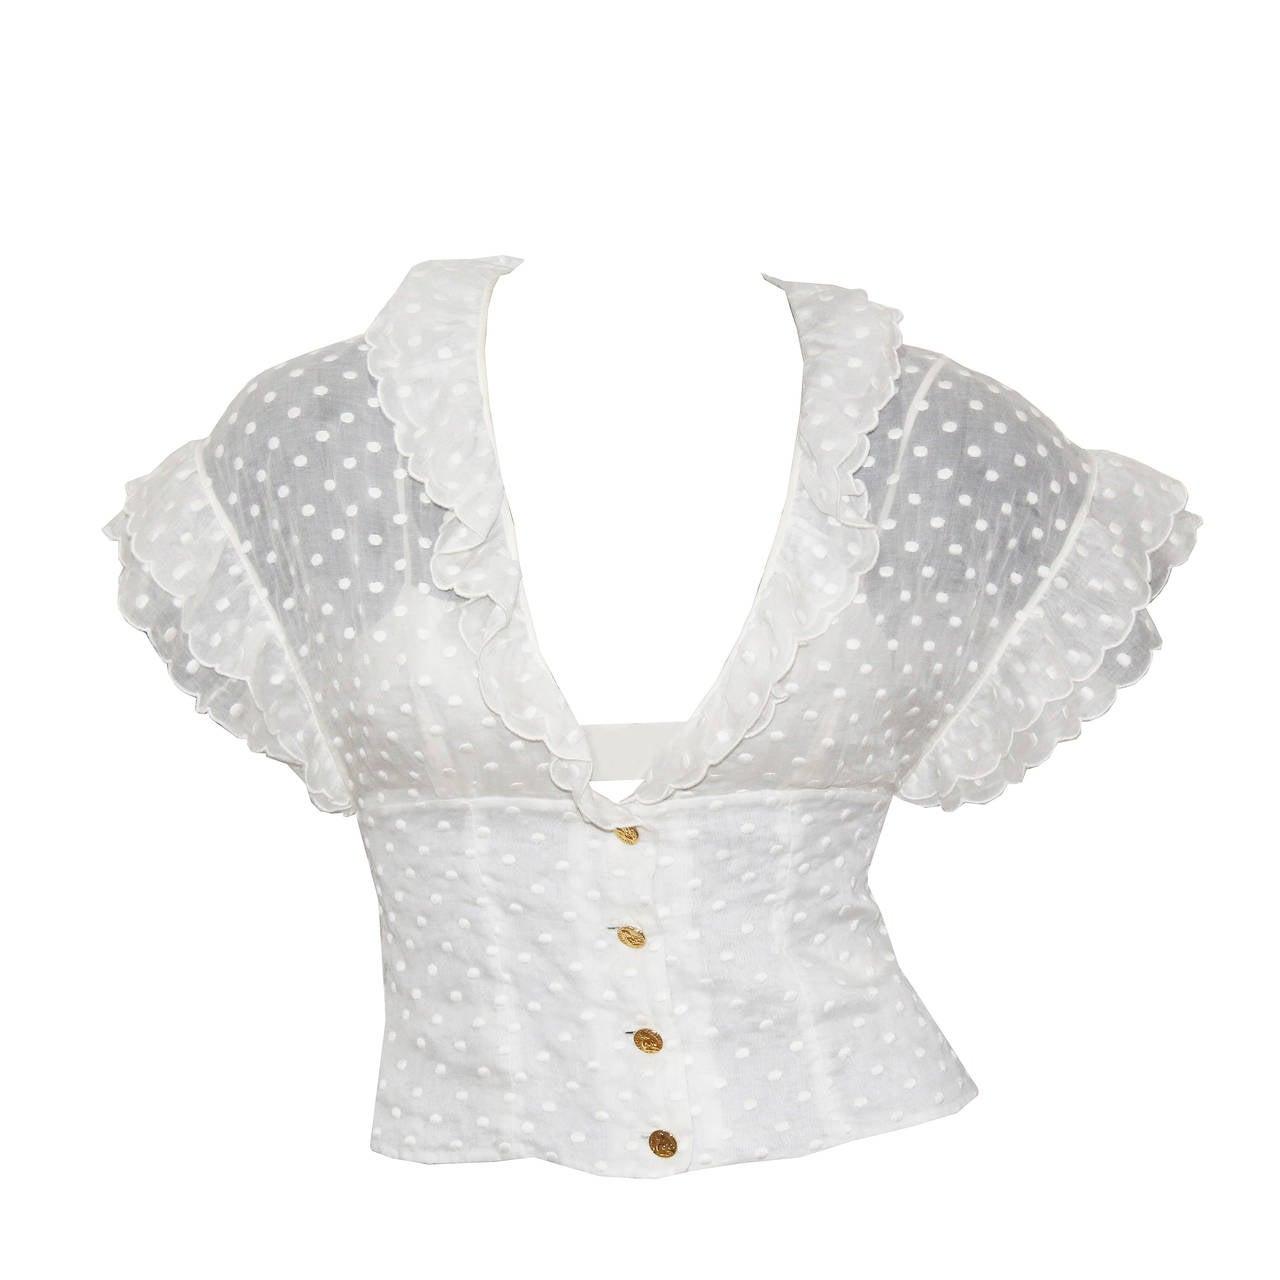 1980s Chanel polkadot ruffle summer blouse 1